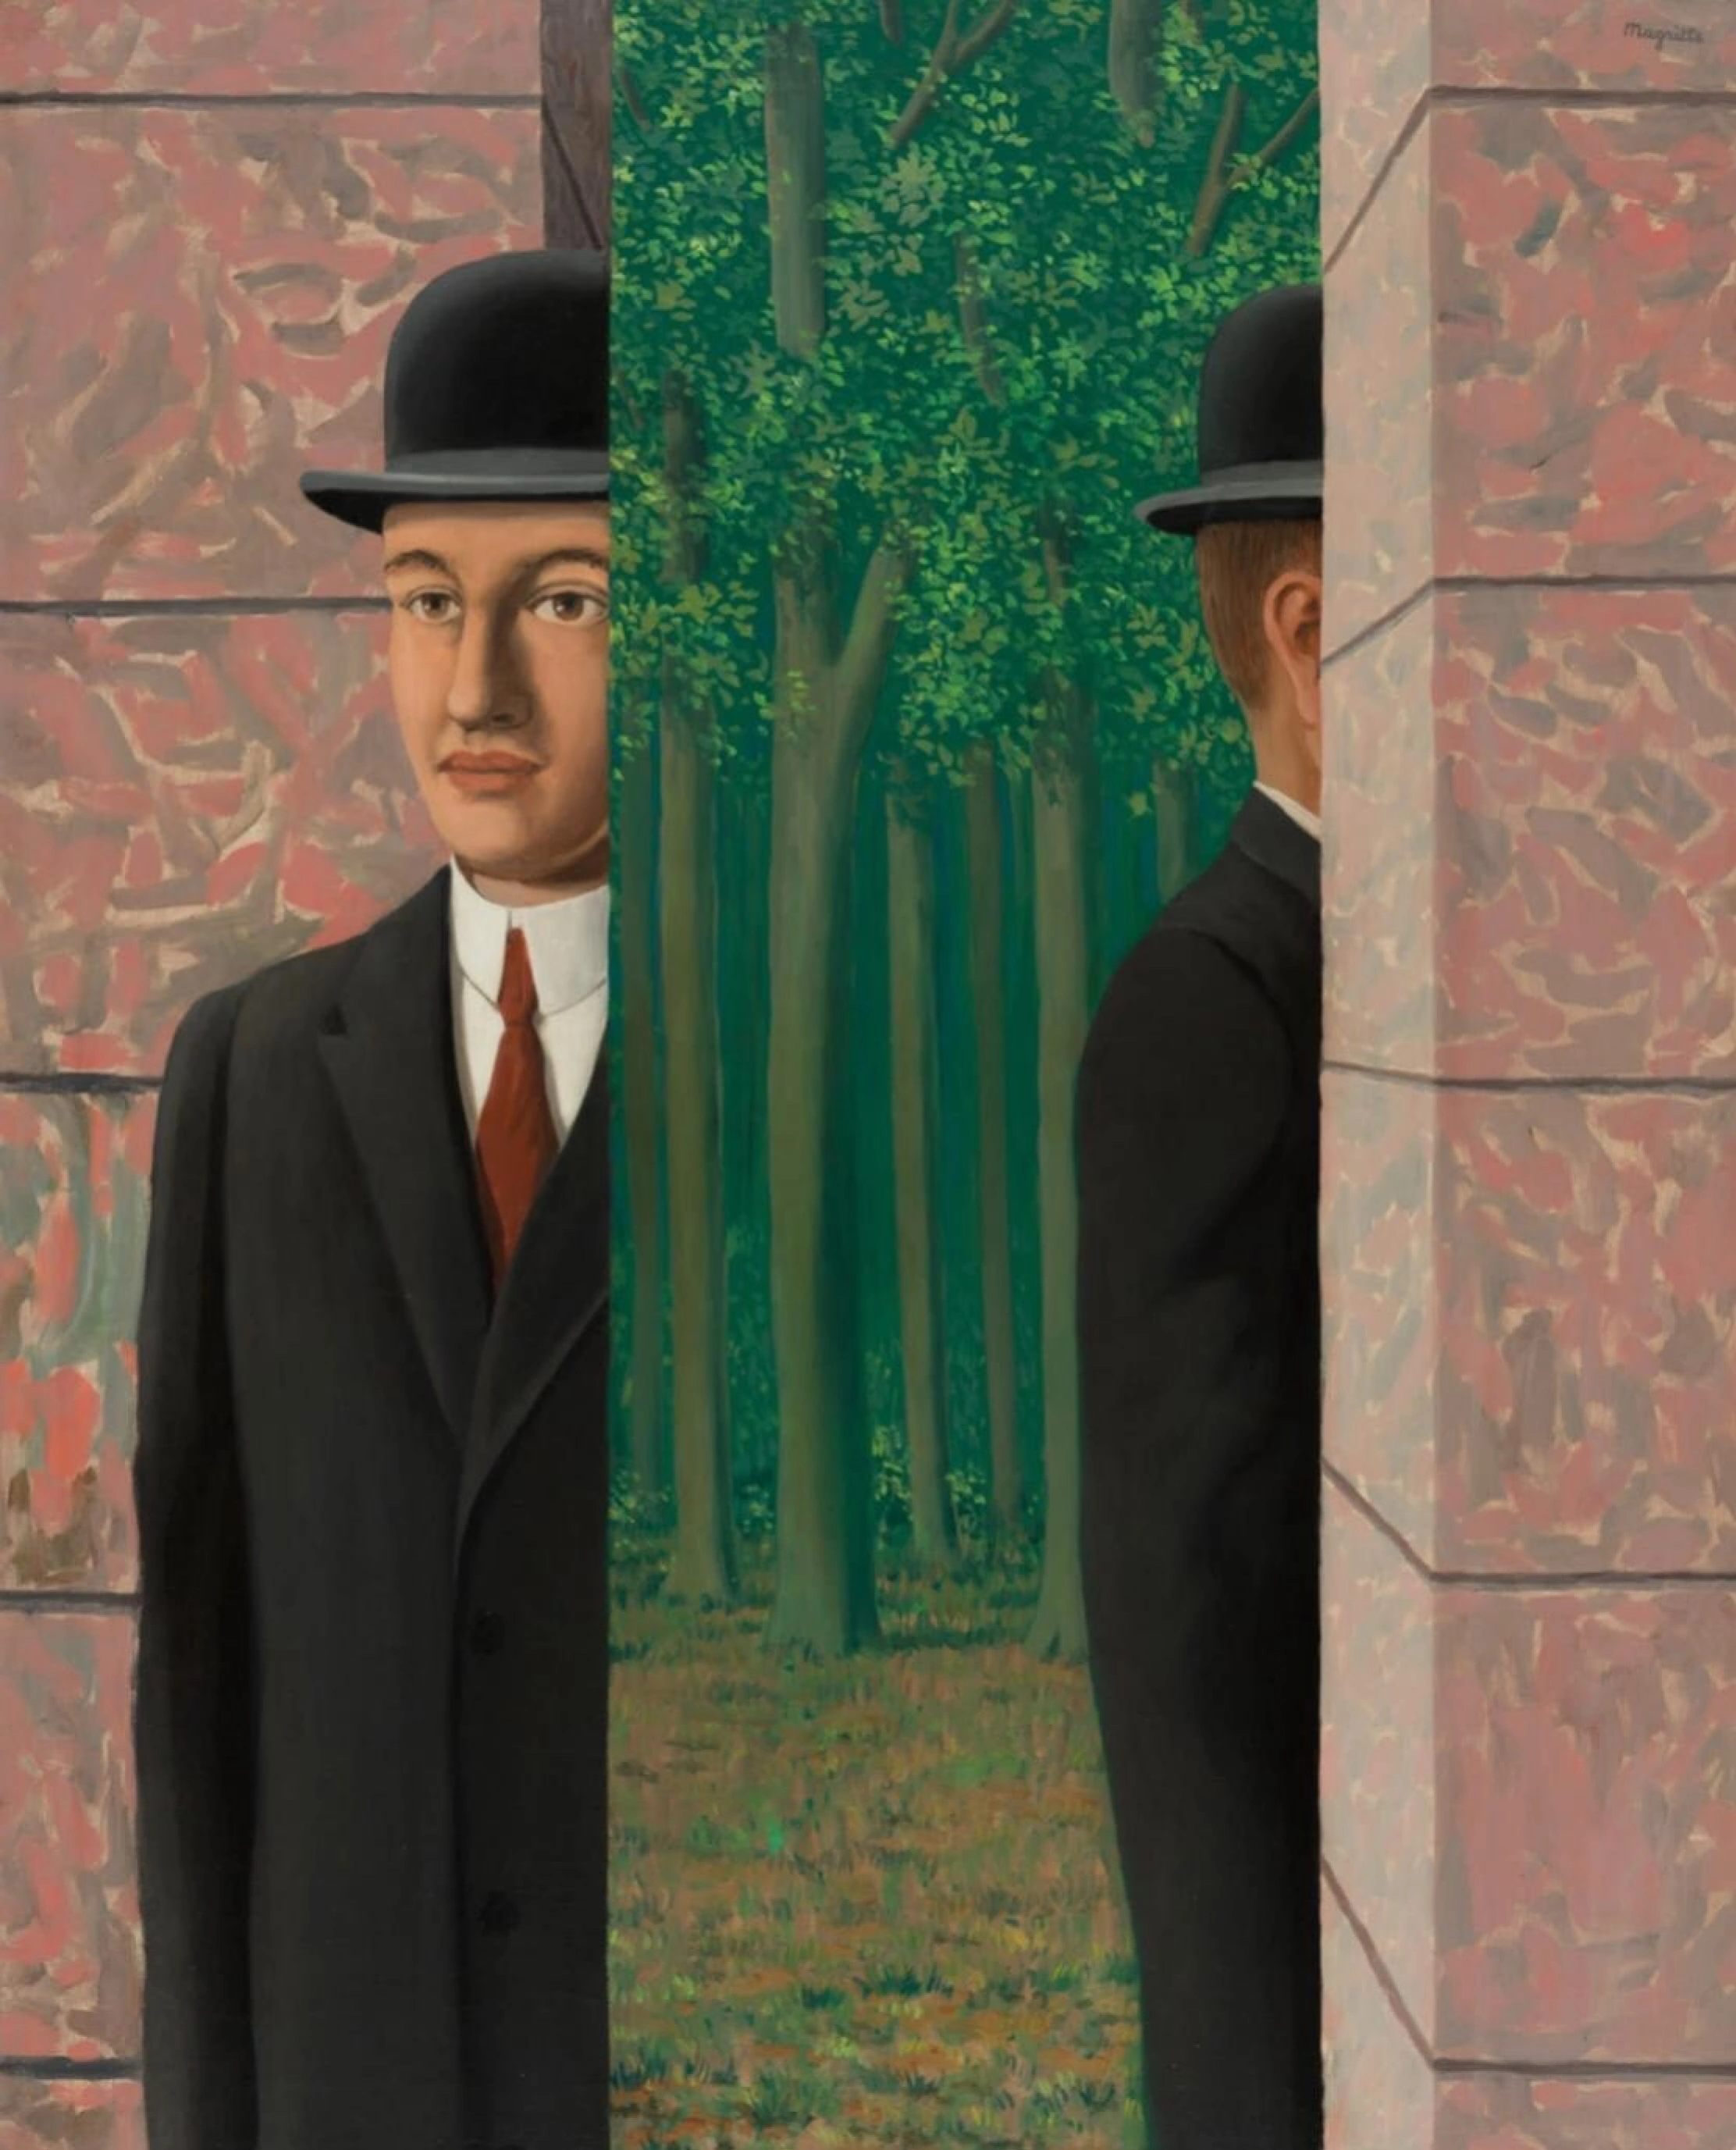 Рене Магритт «Общее место» (1964)